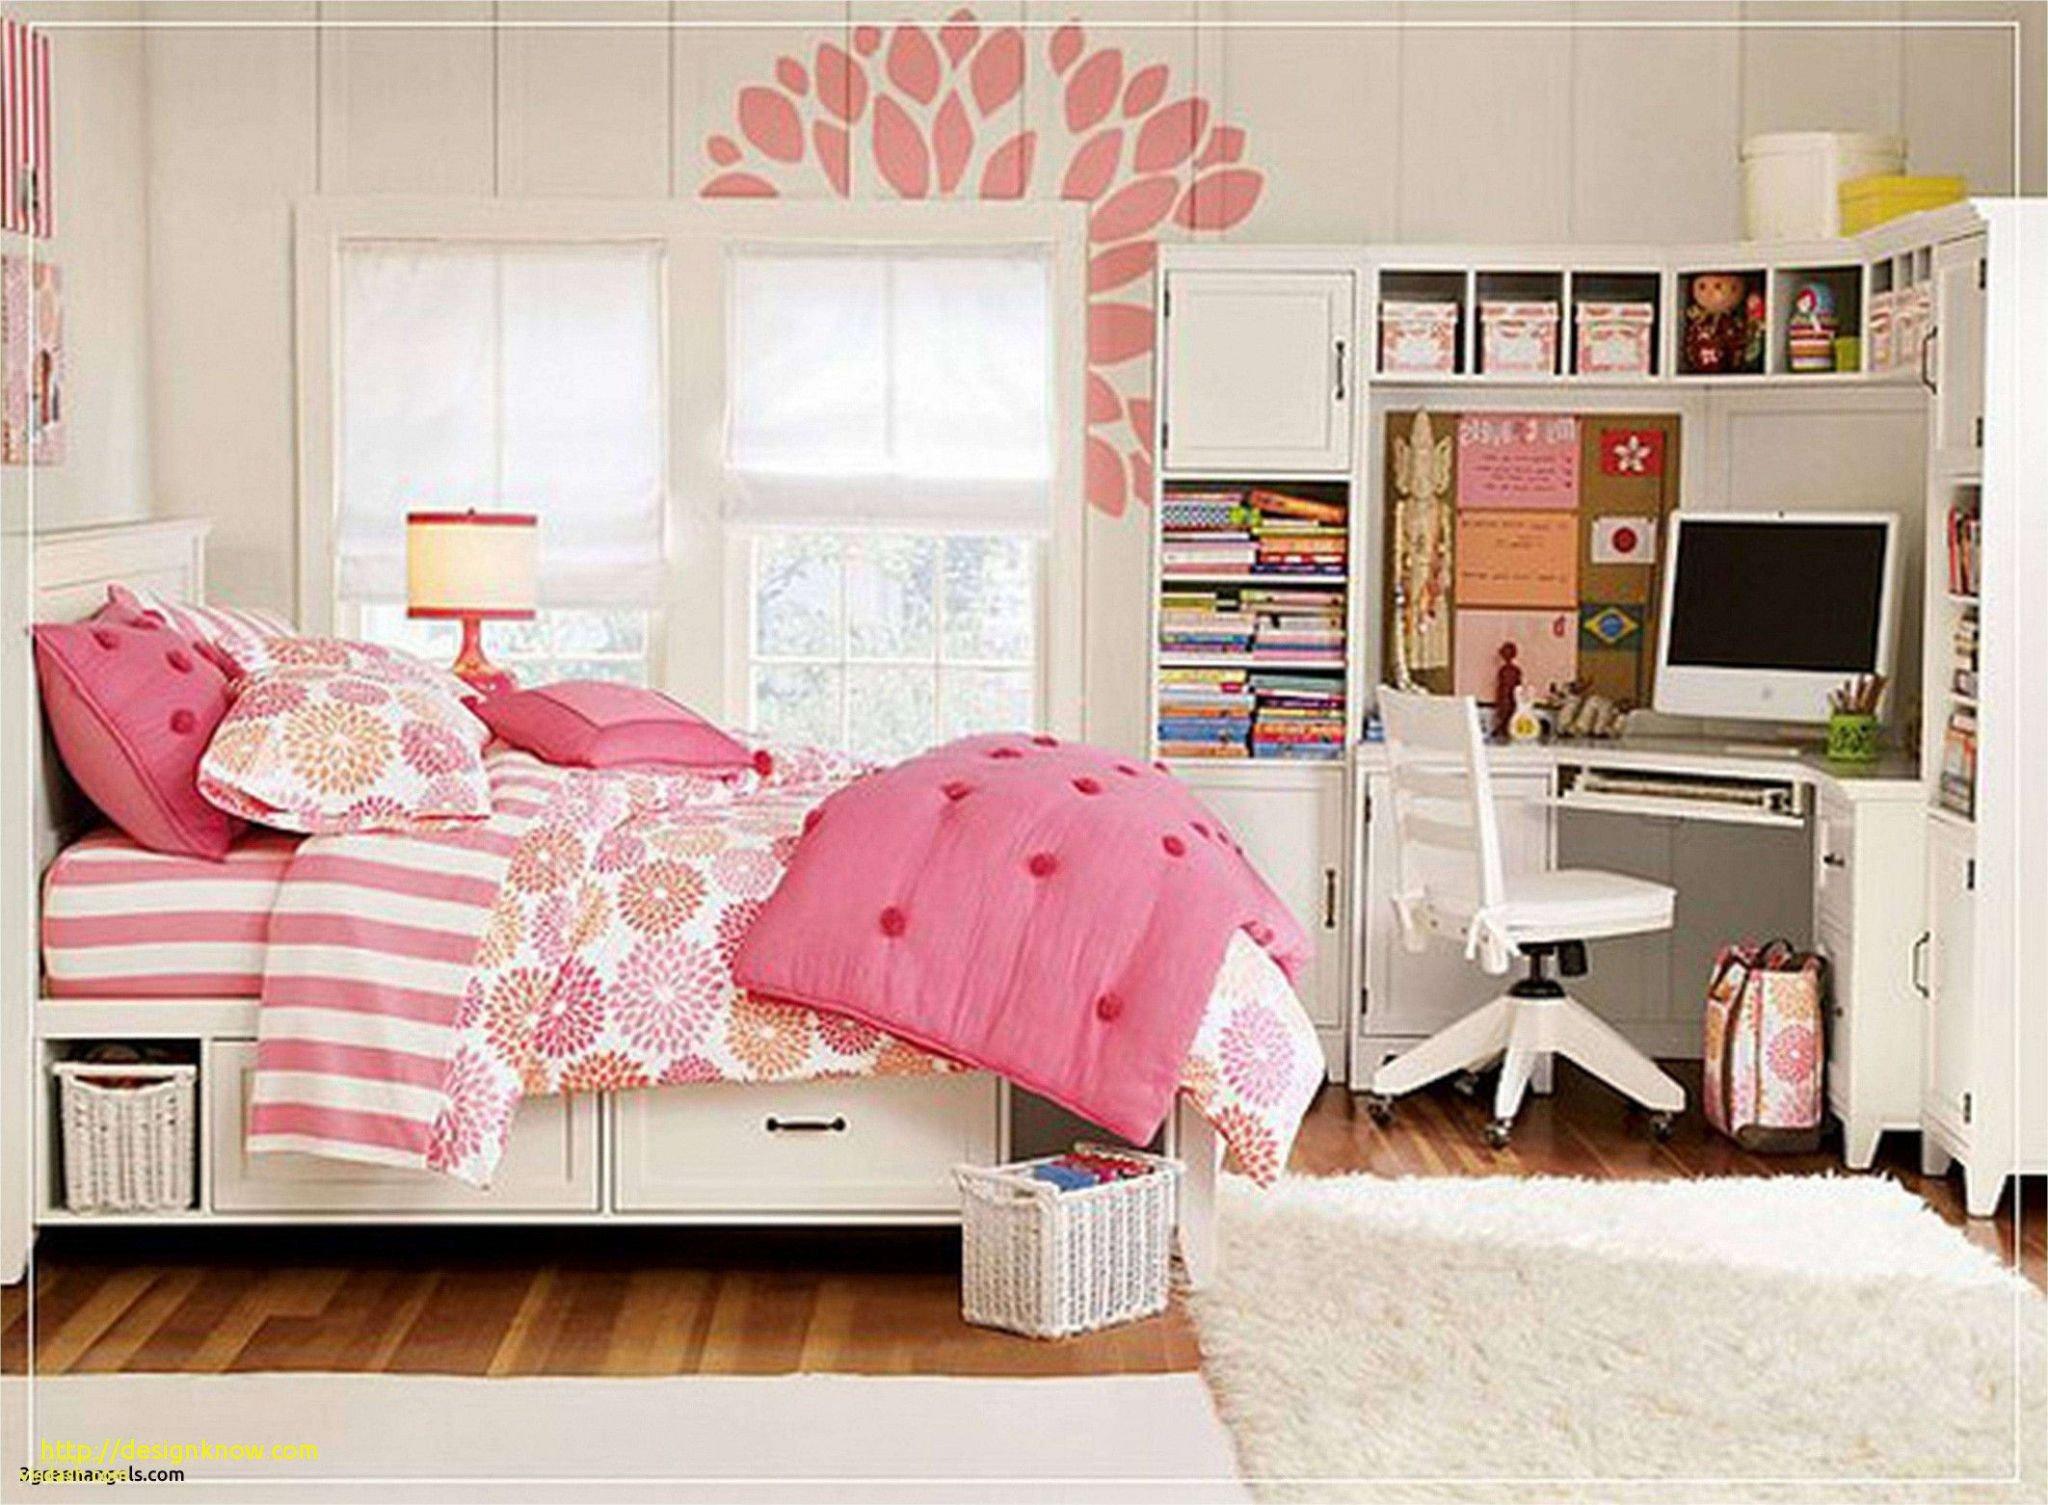 Cheap King Bedroom Set Unique Unique Interior Design for Small Size Bedroom